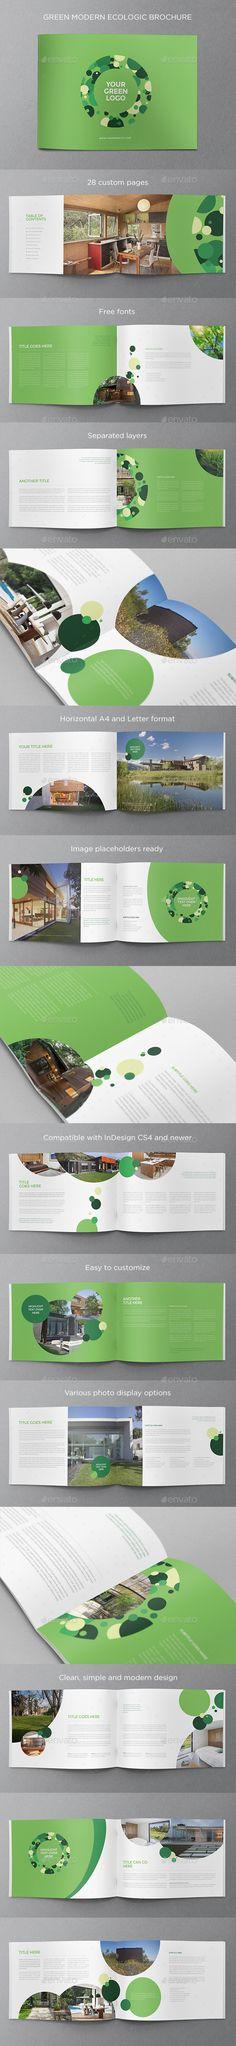 Green Modern Ecologic Brochure - Brochures Print Templates